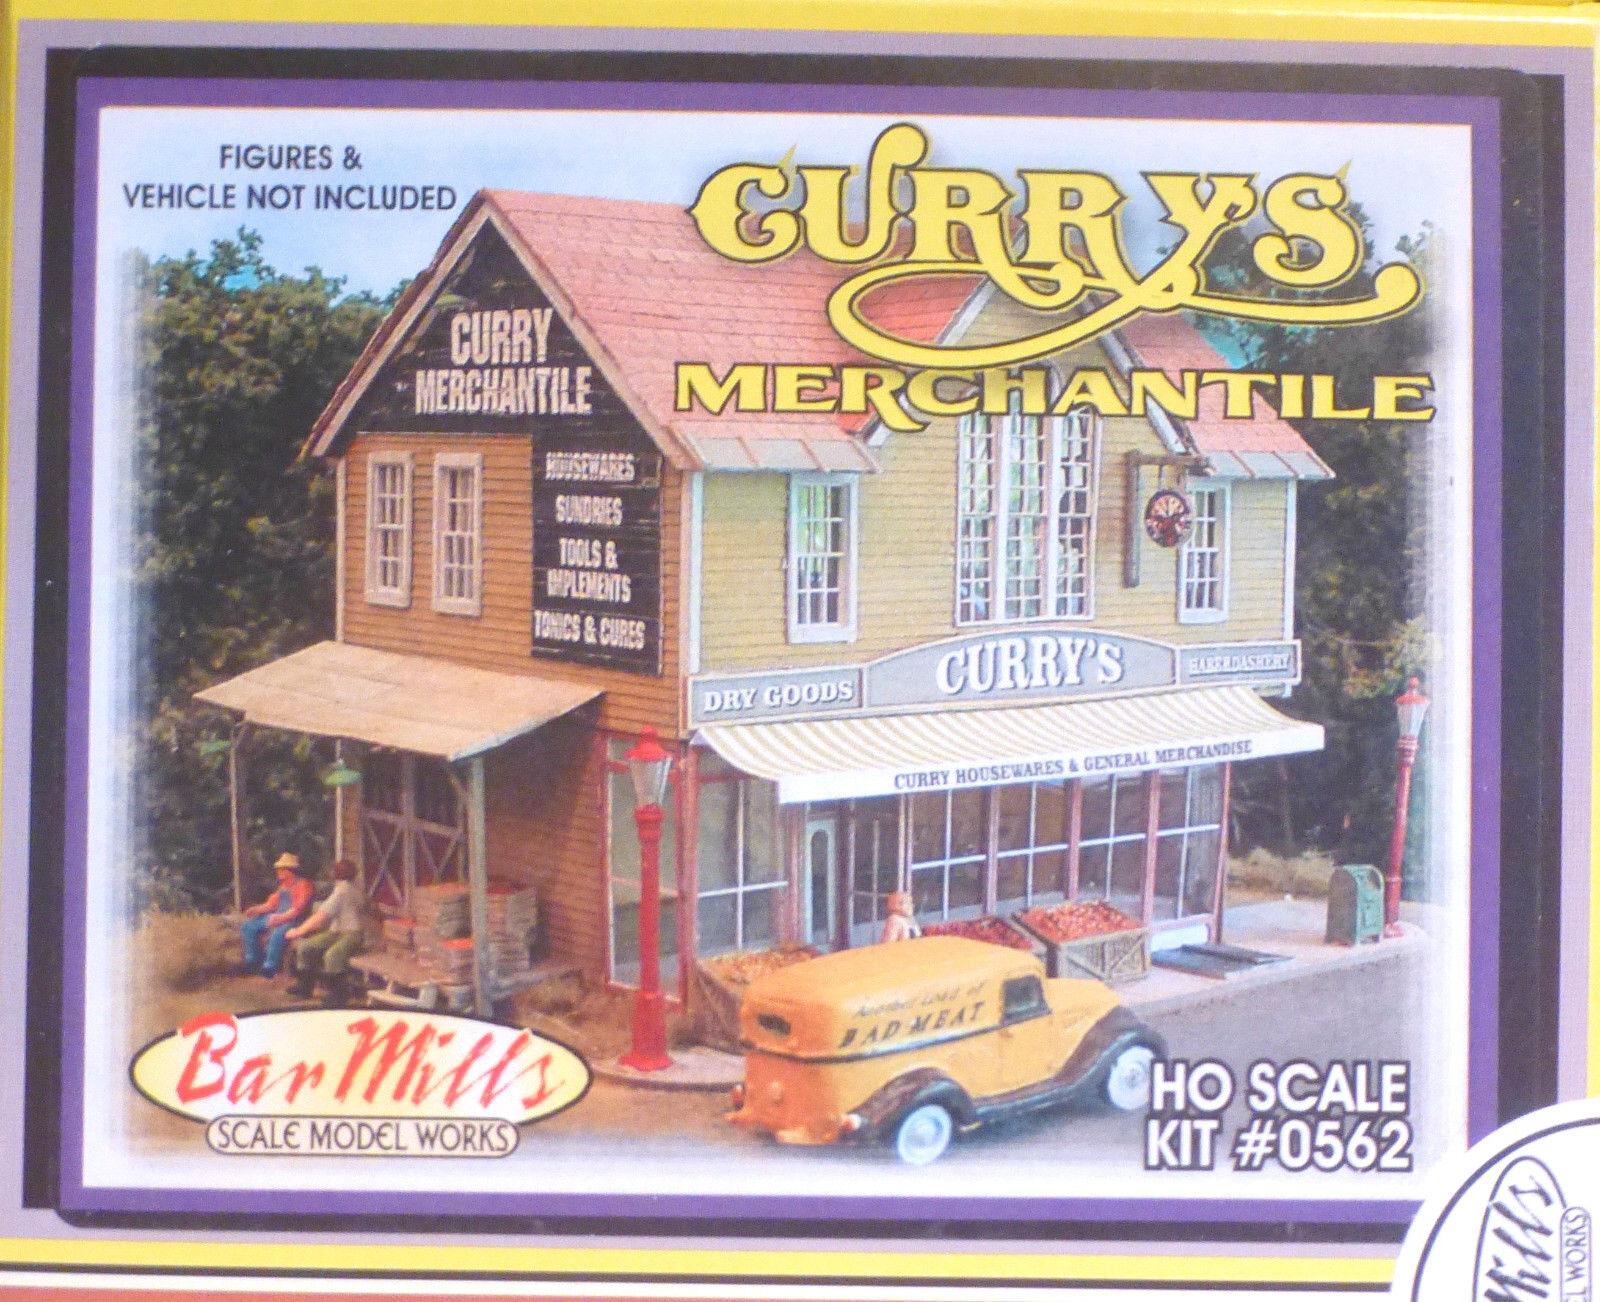 BAR Mills  562 scala HO Curry MERCANTILE KIT Kit di costruzione